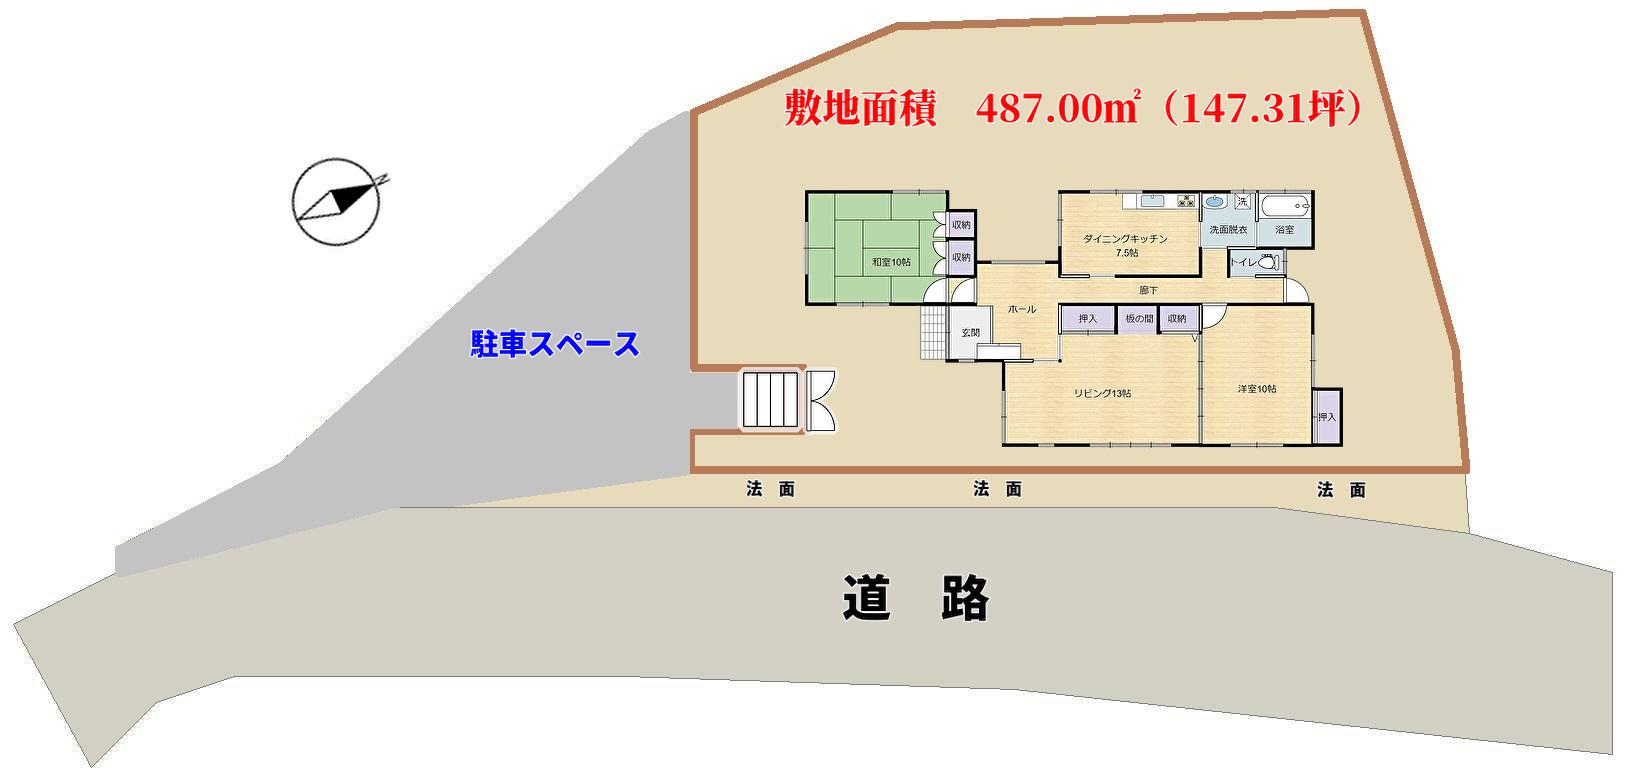 千葉県南房総市千倉町の物件敷地図